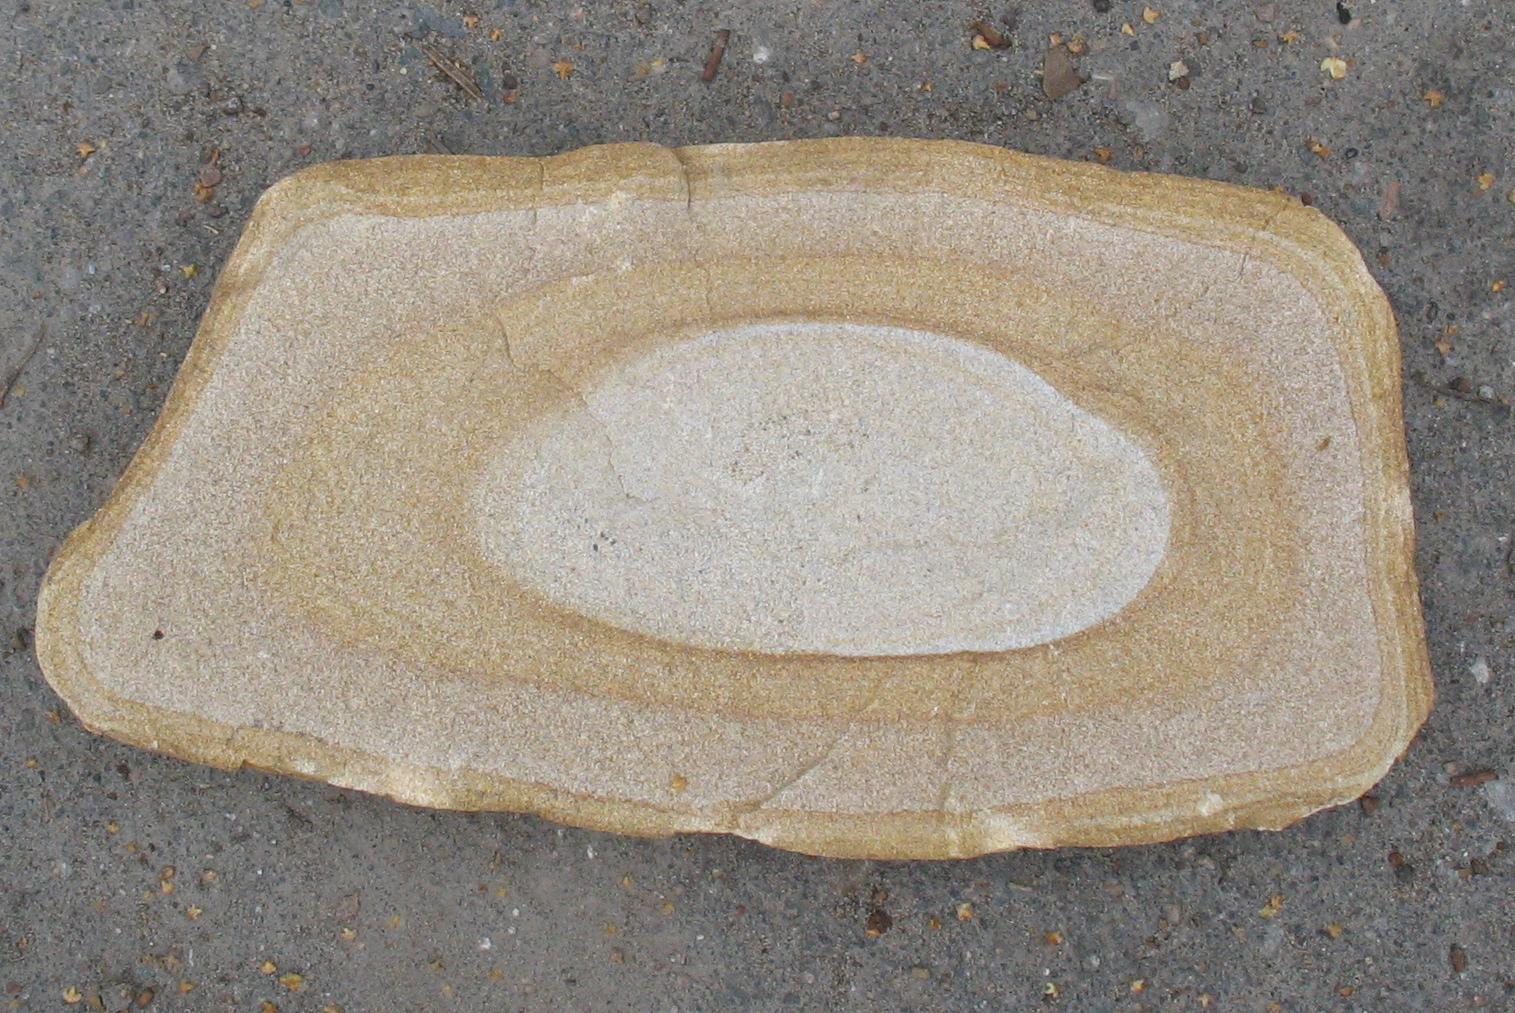 Образец камня Булыжник облицовочный Жёлтый